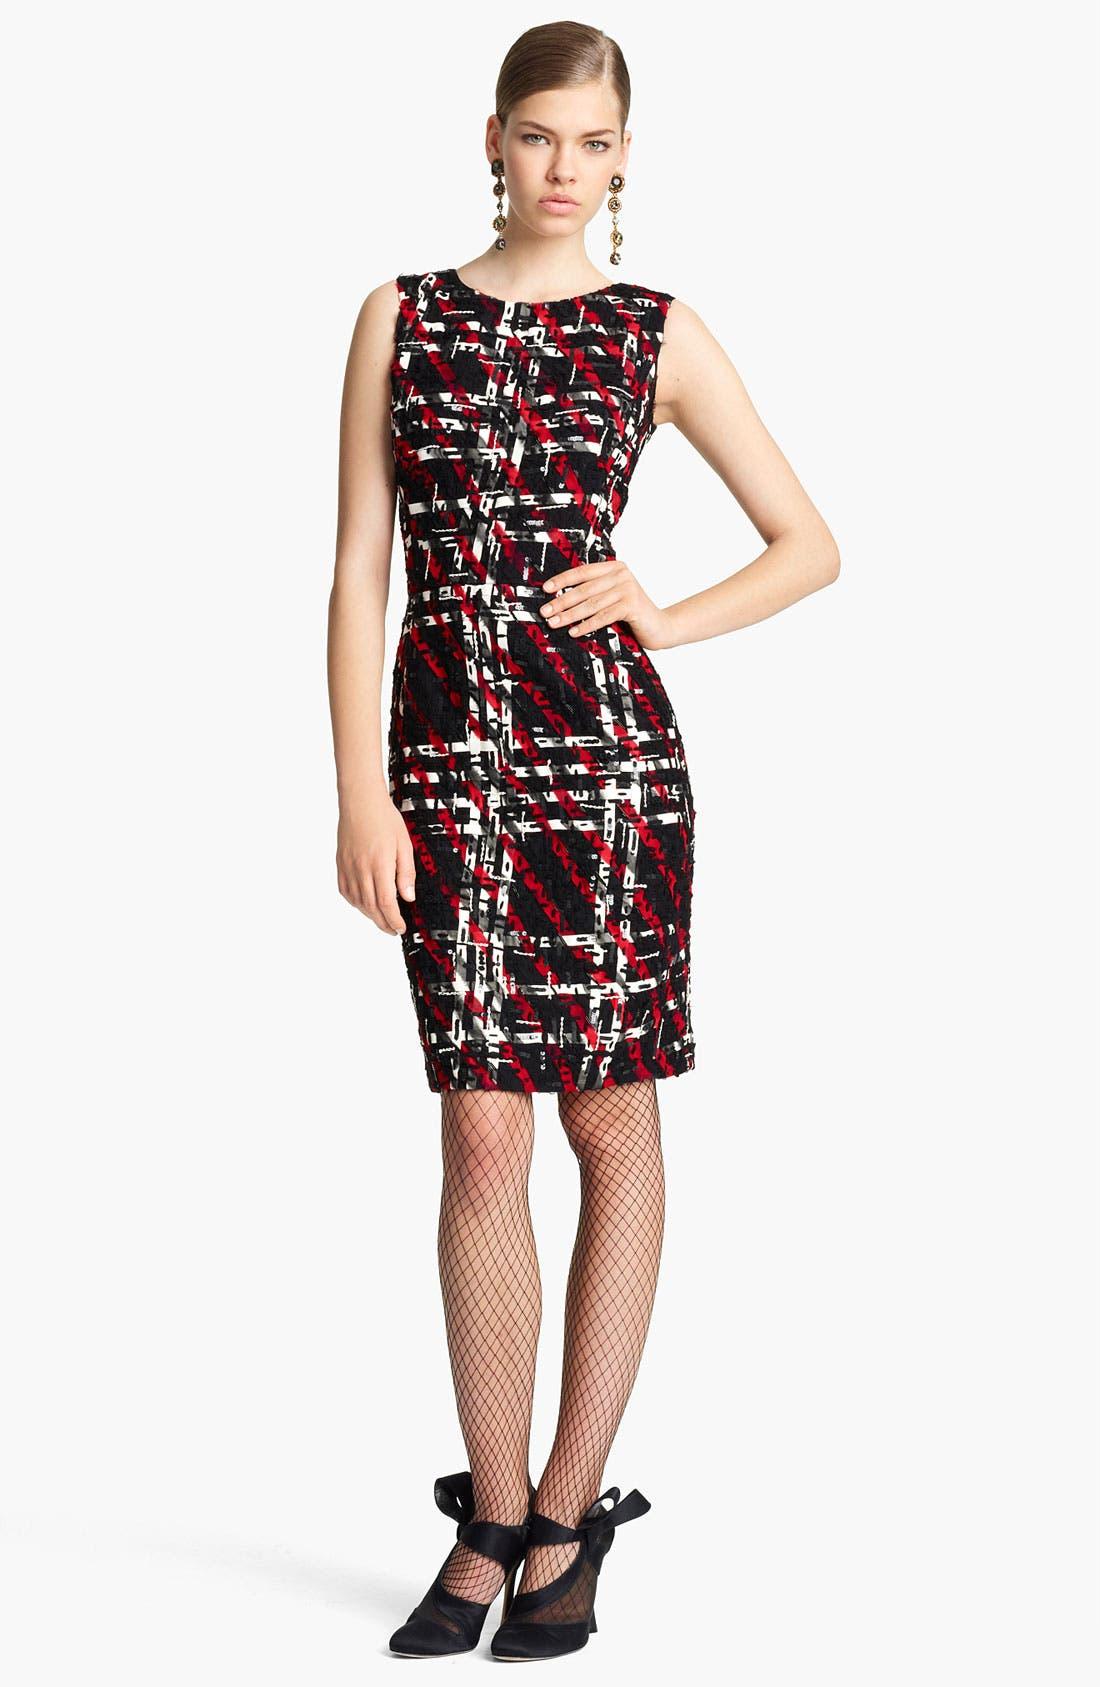 Main Image - Oscar de la Renta Georgette Embroidered Tweed Dress